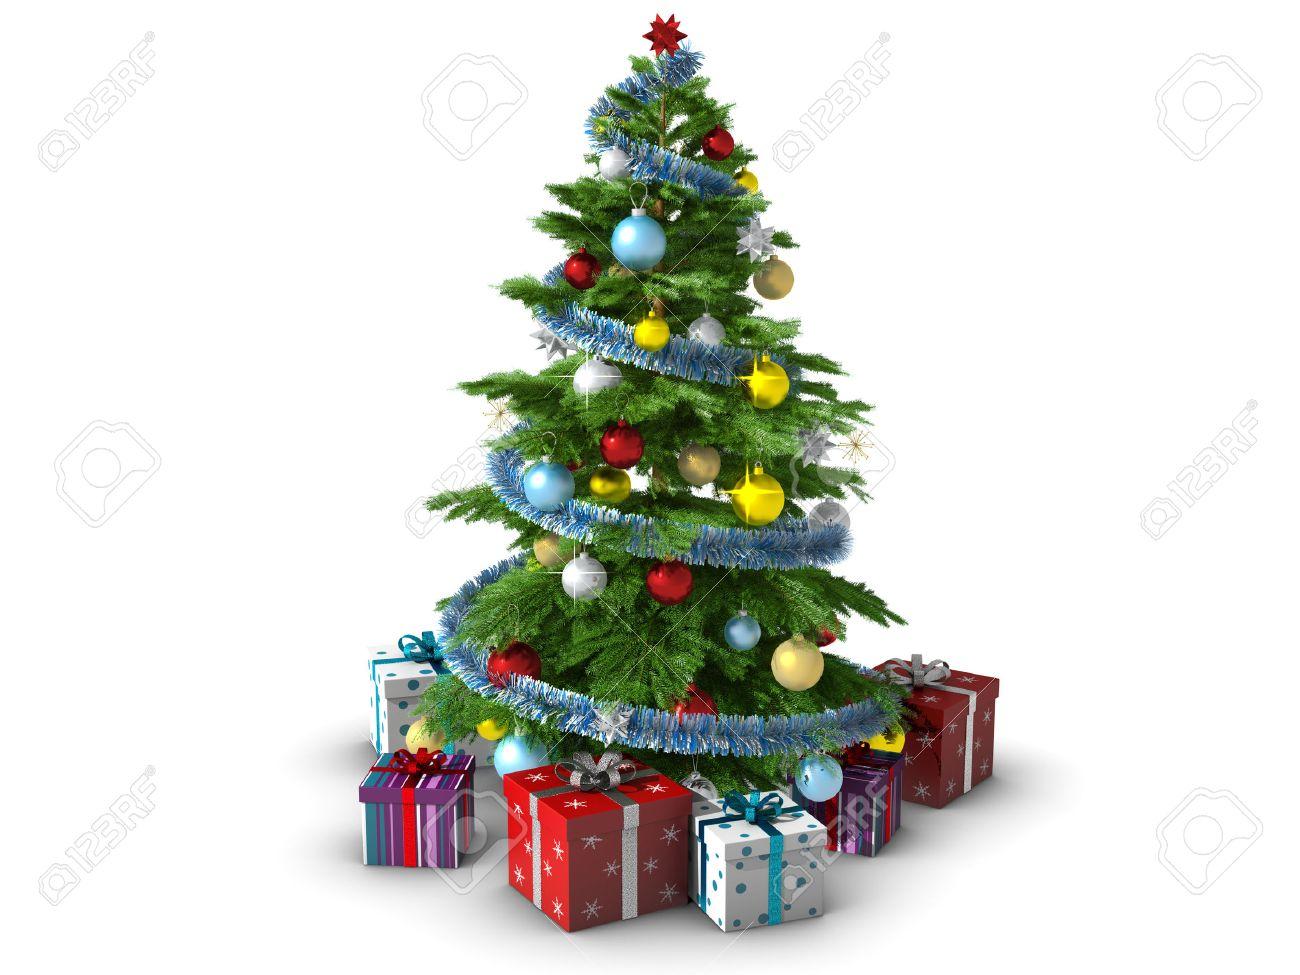 Christmas Tree White Background.Decorated Christmas Tree Isolated On White Background